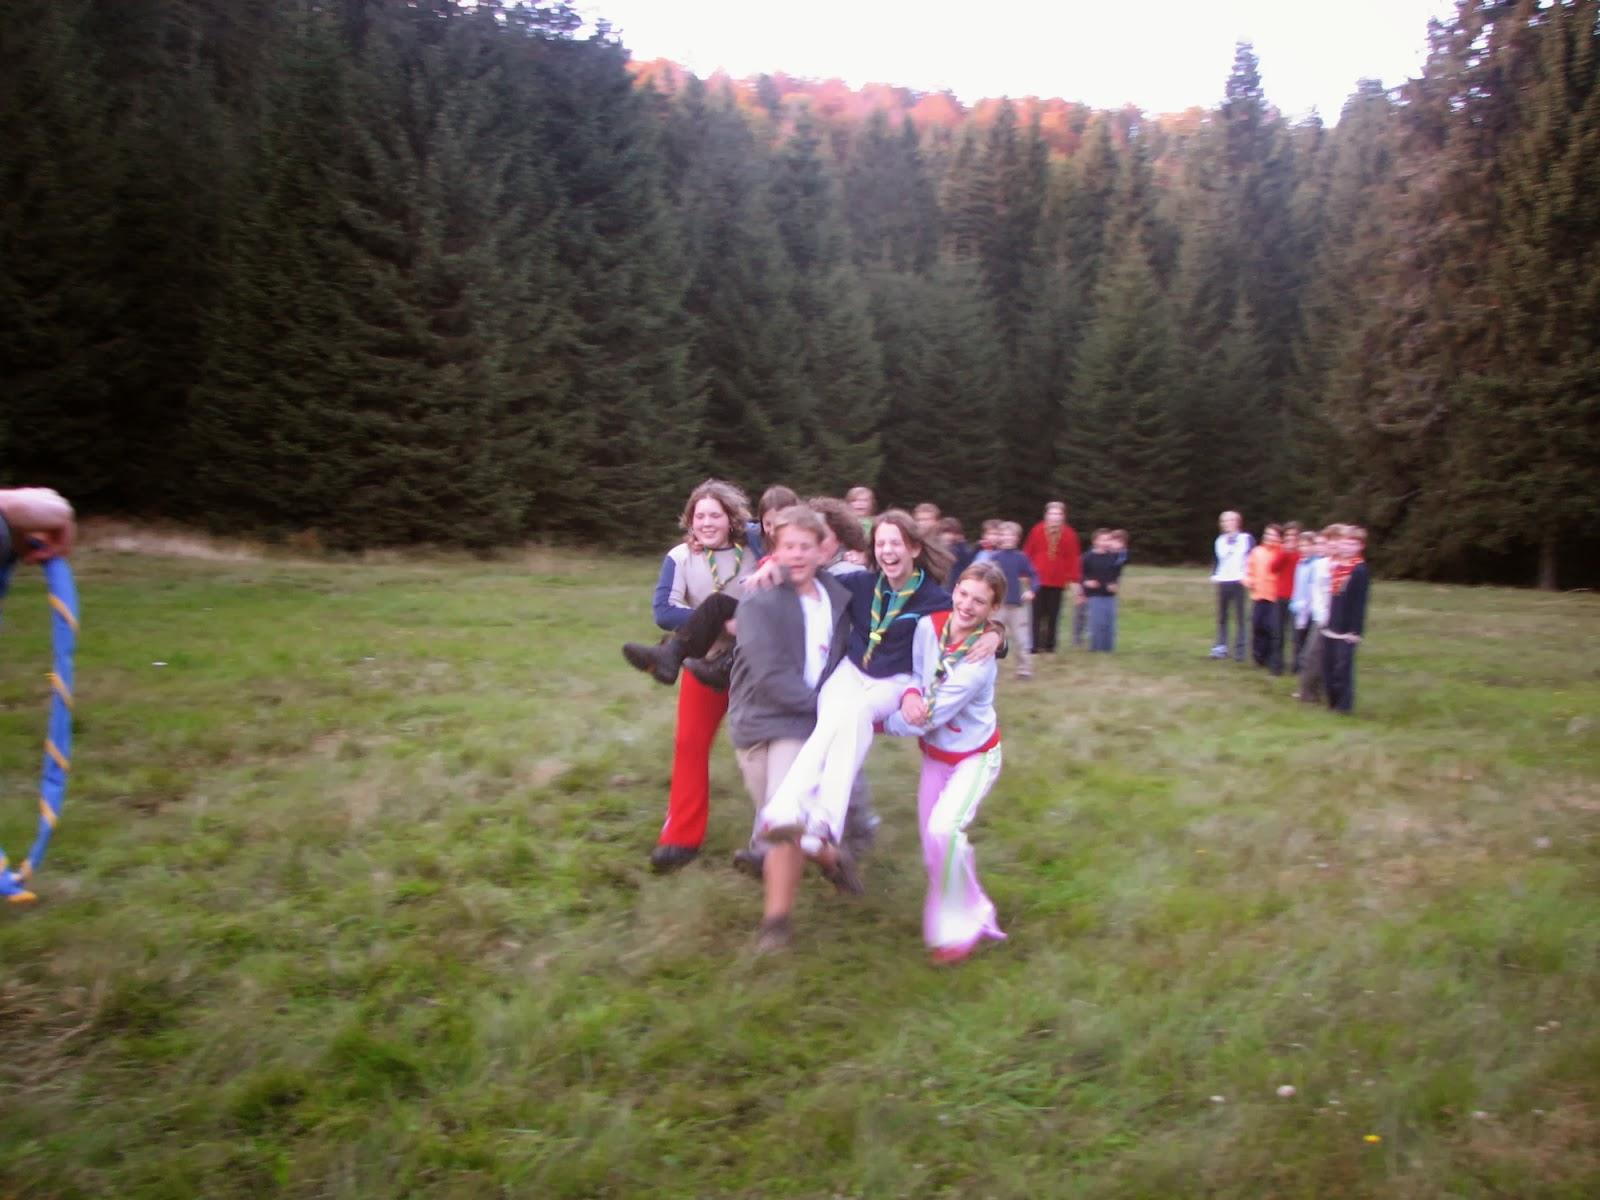 Vodov izlet, Ilirska Bistrica 2005 - Picture%2B247.jpg